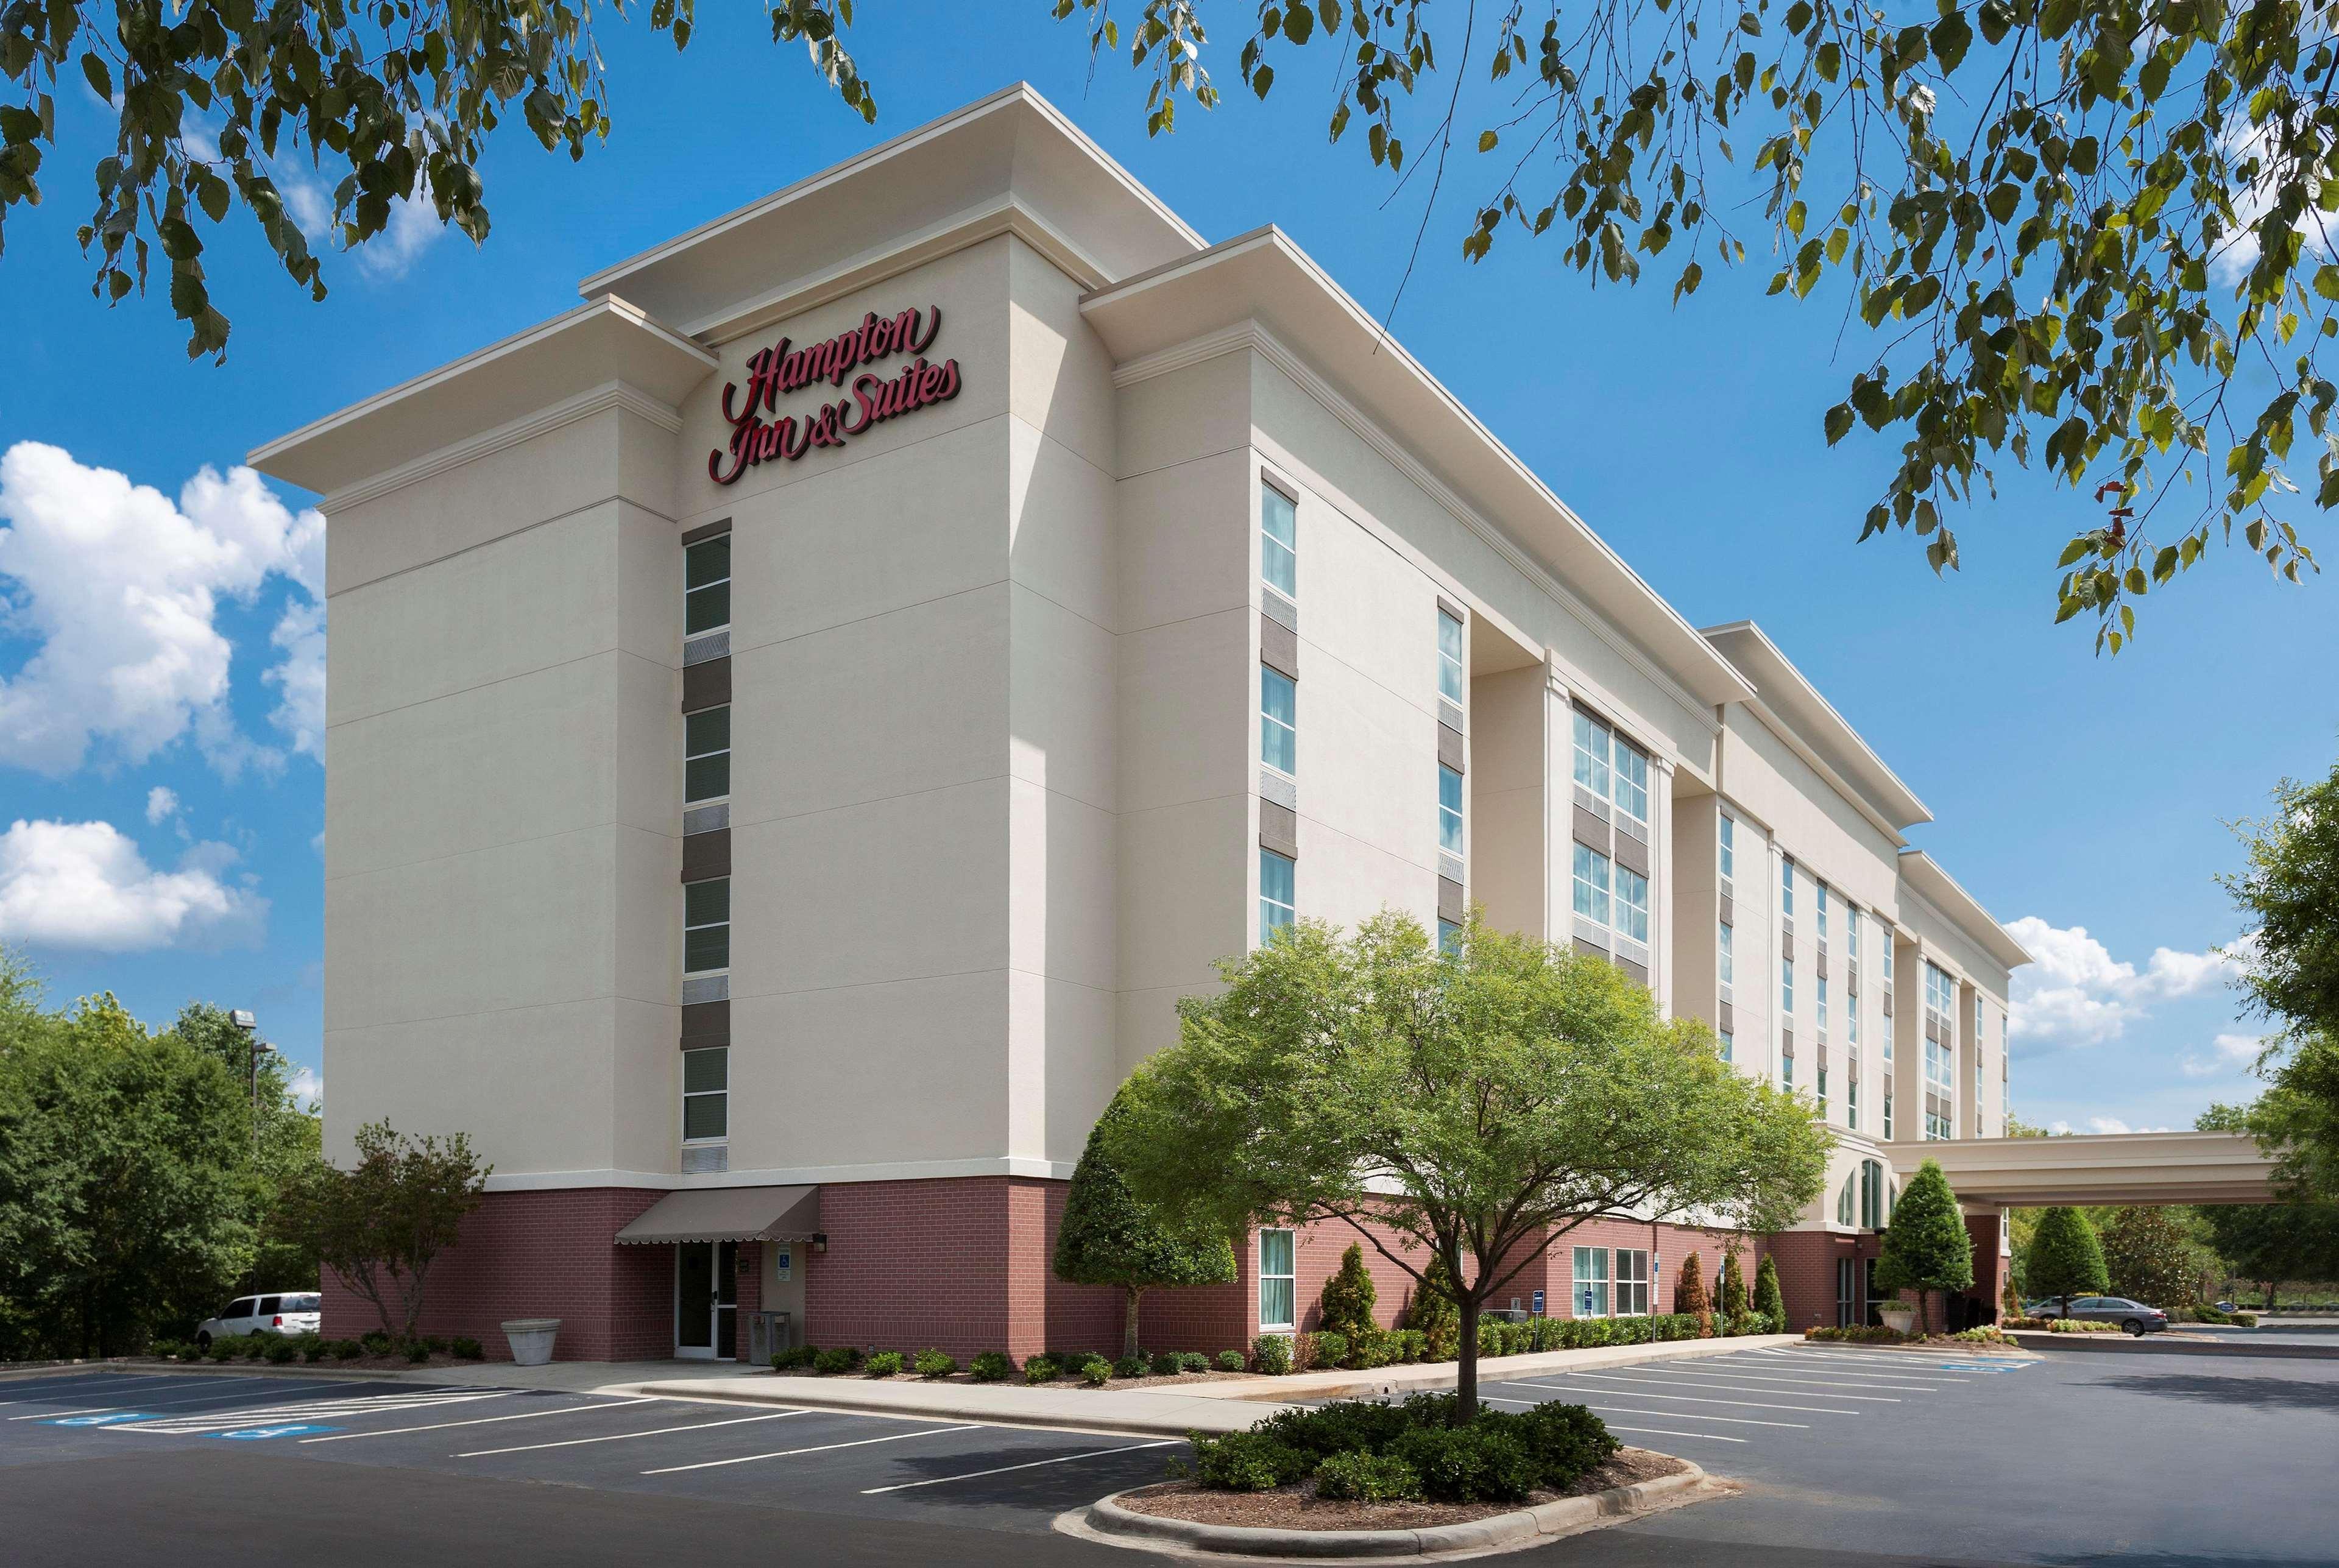 Hampton Inn & Suites Charlotte/Pineville image 7